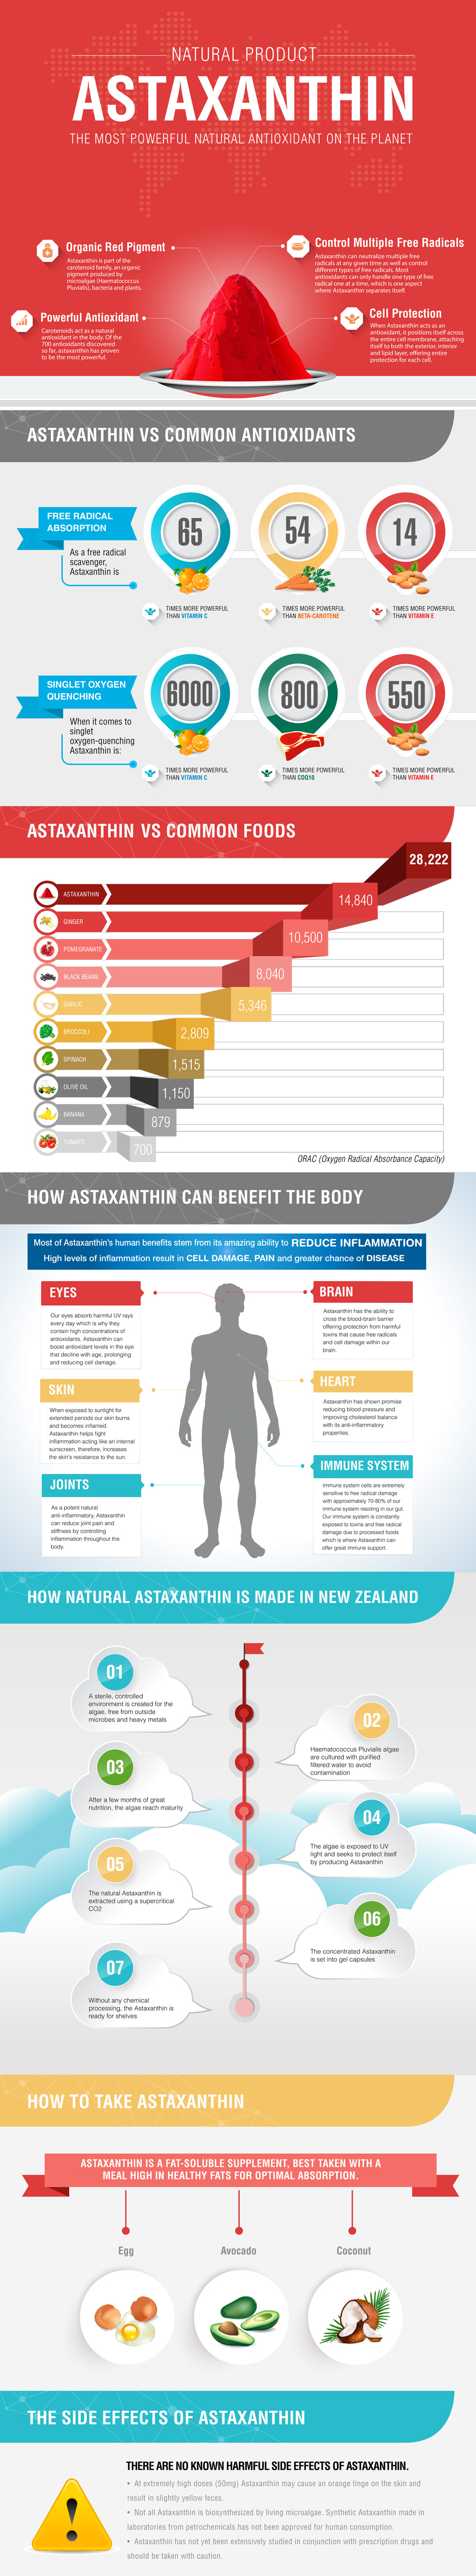 Astaxanthin - Nature's Most Powerful Antioxidant